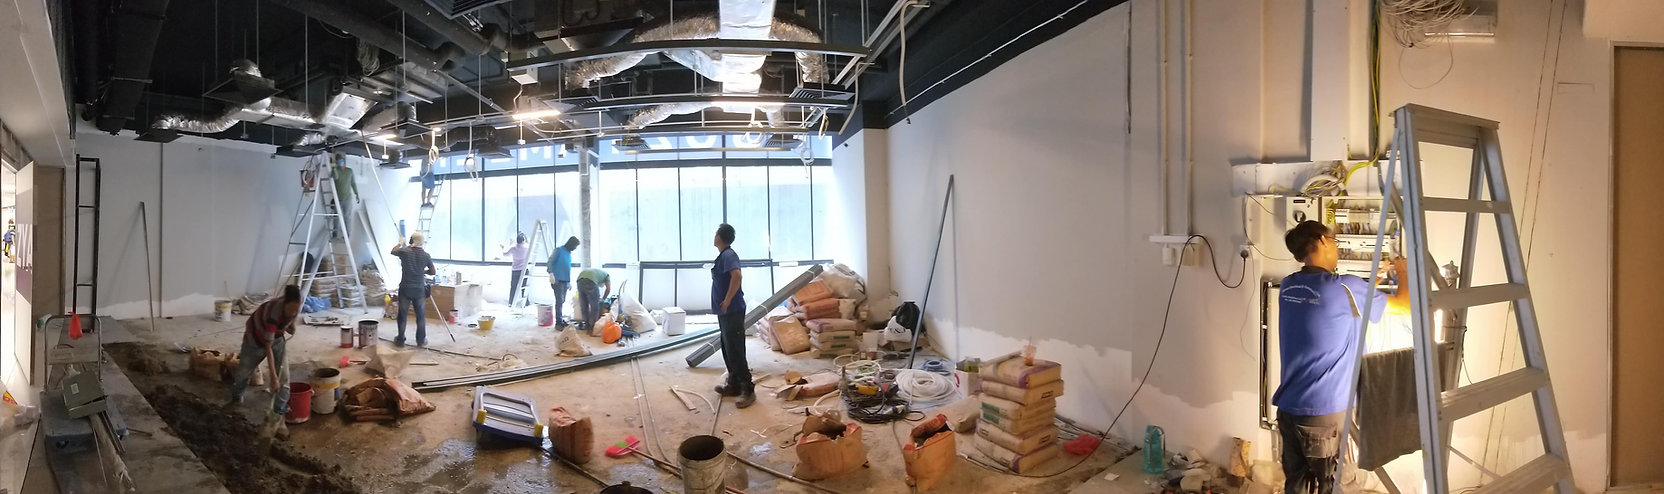 Renovation site in progress